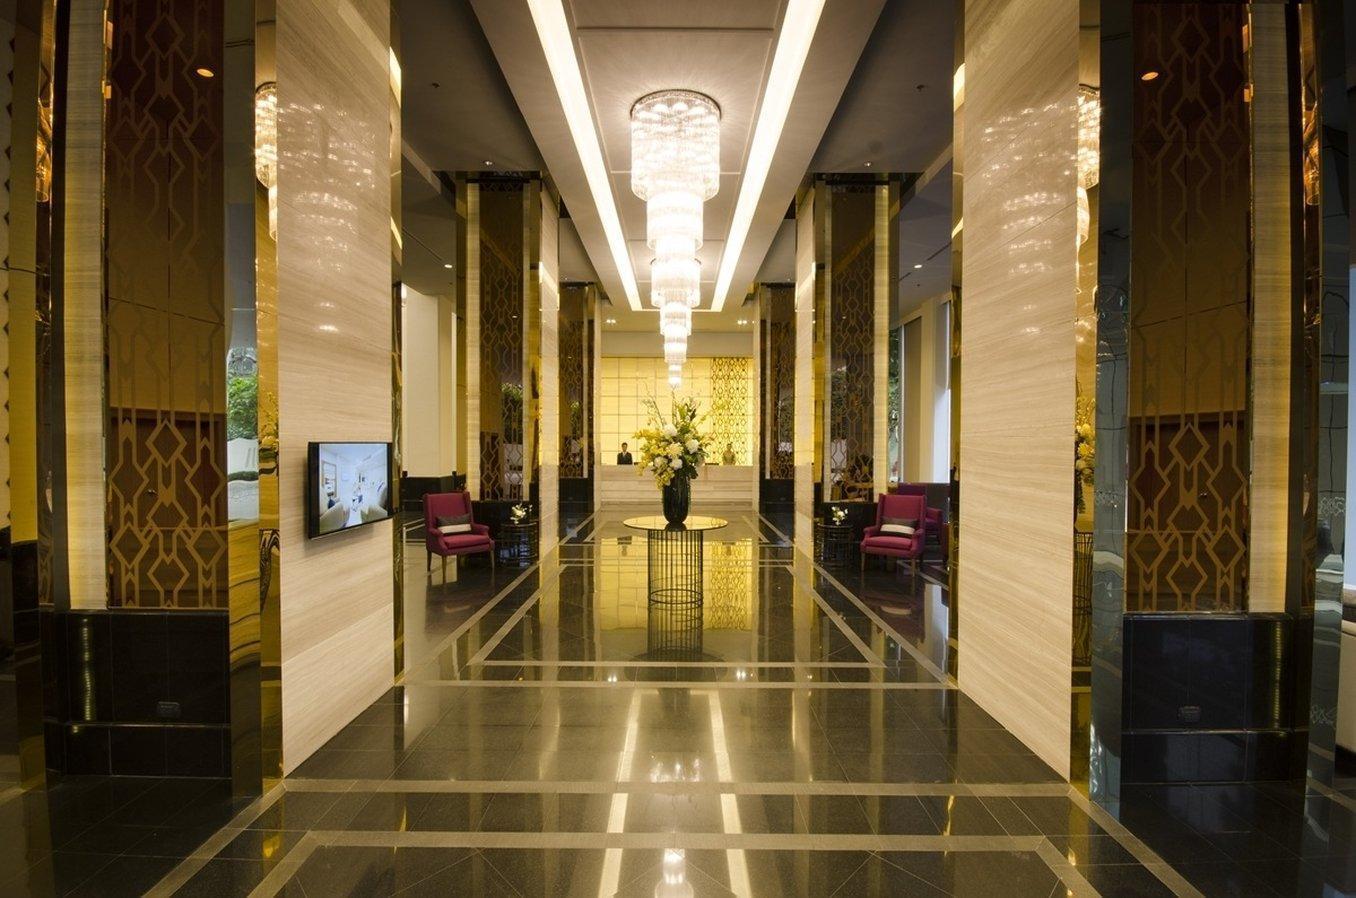 Grande Centre Point Hotel Ploenchit โรงแรมแกรนด์ เซ็นเตอร์พอยต์ เพลินจิต